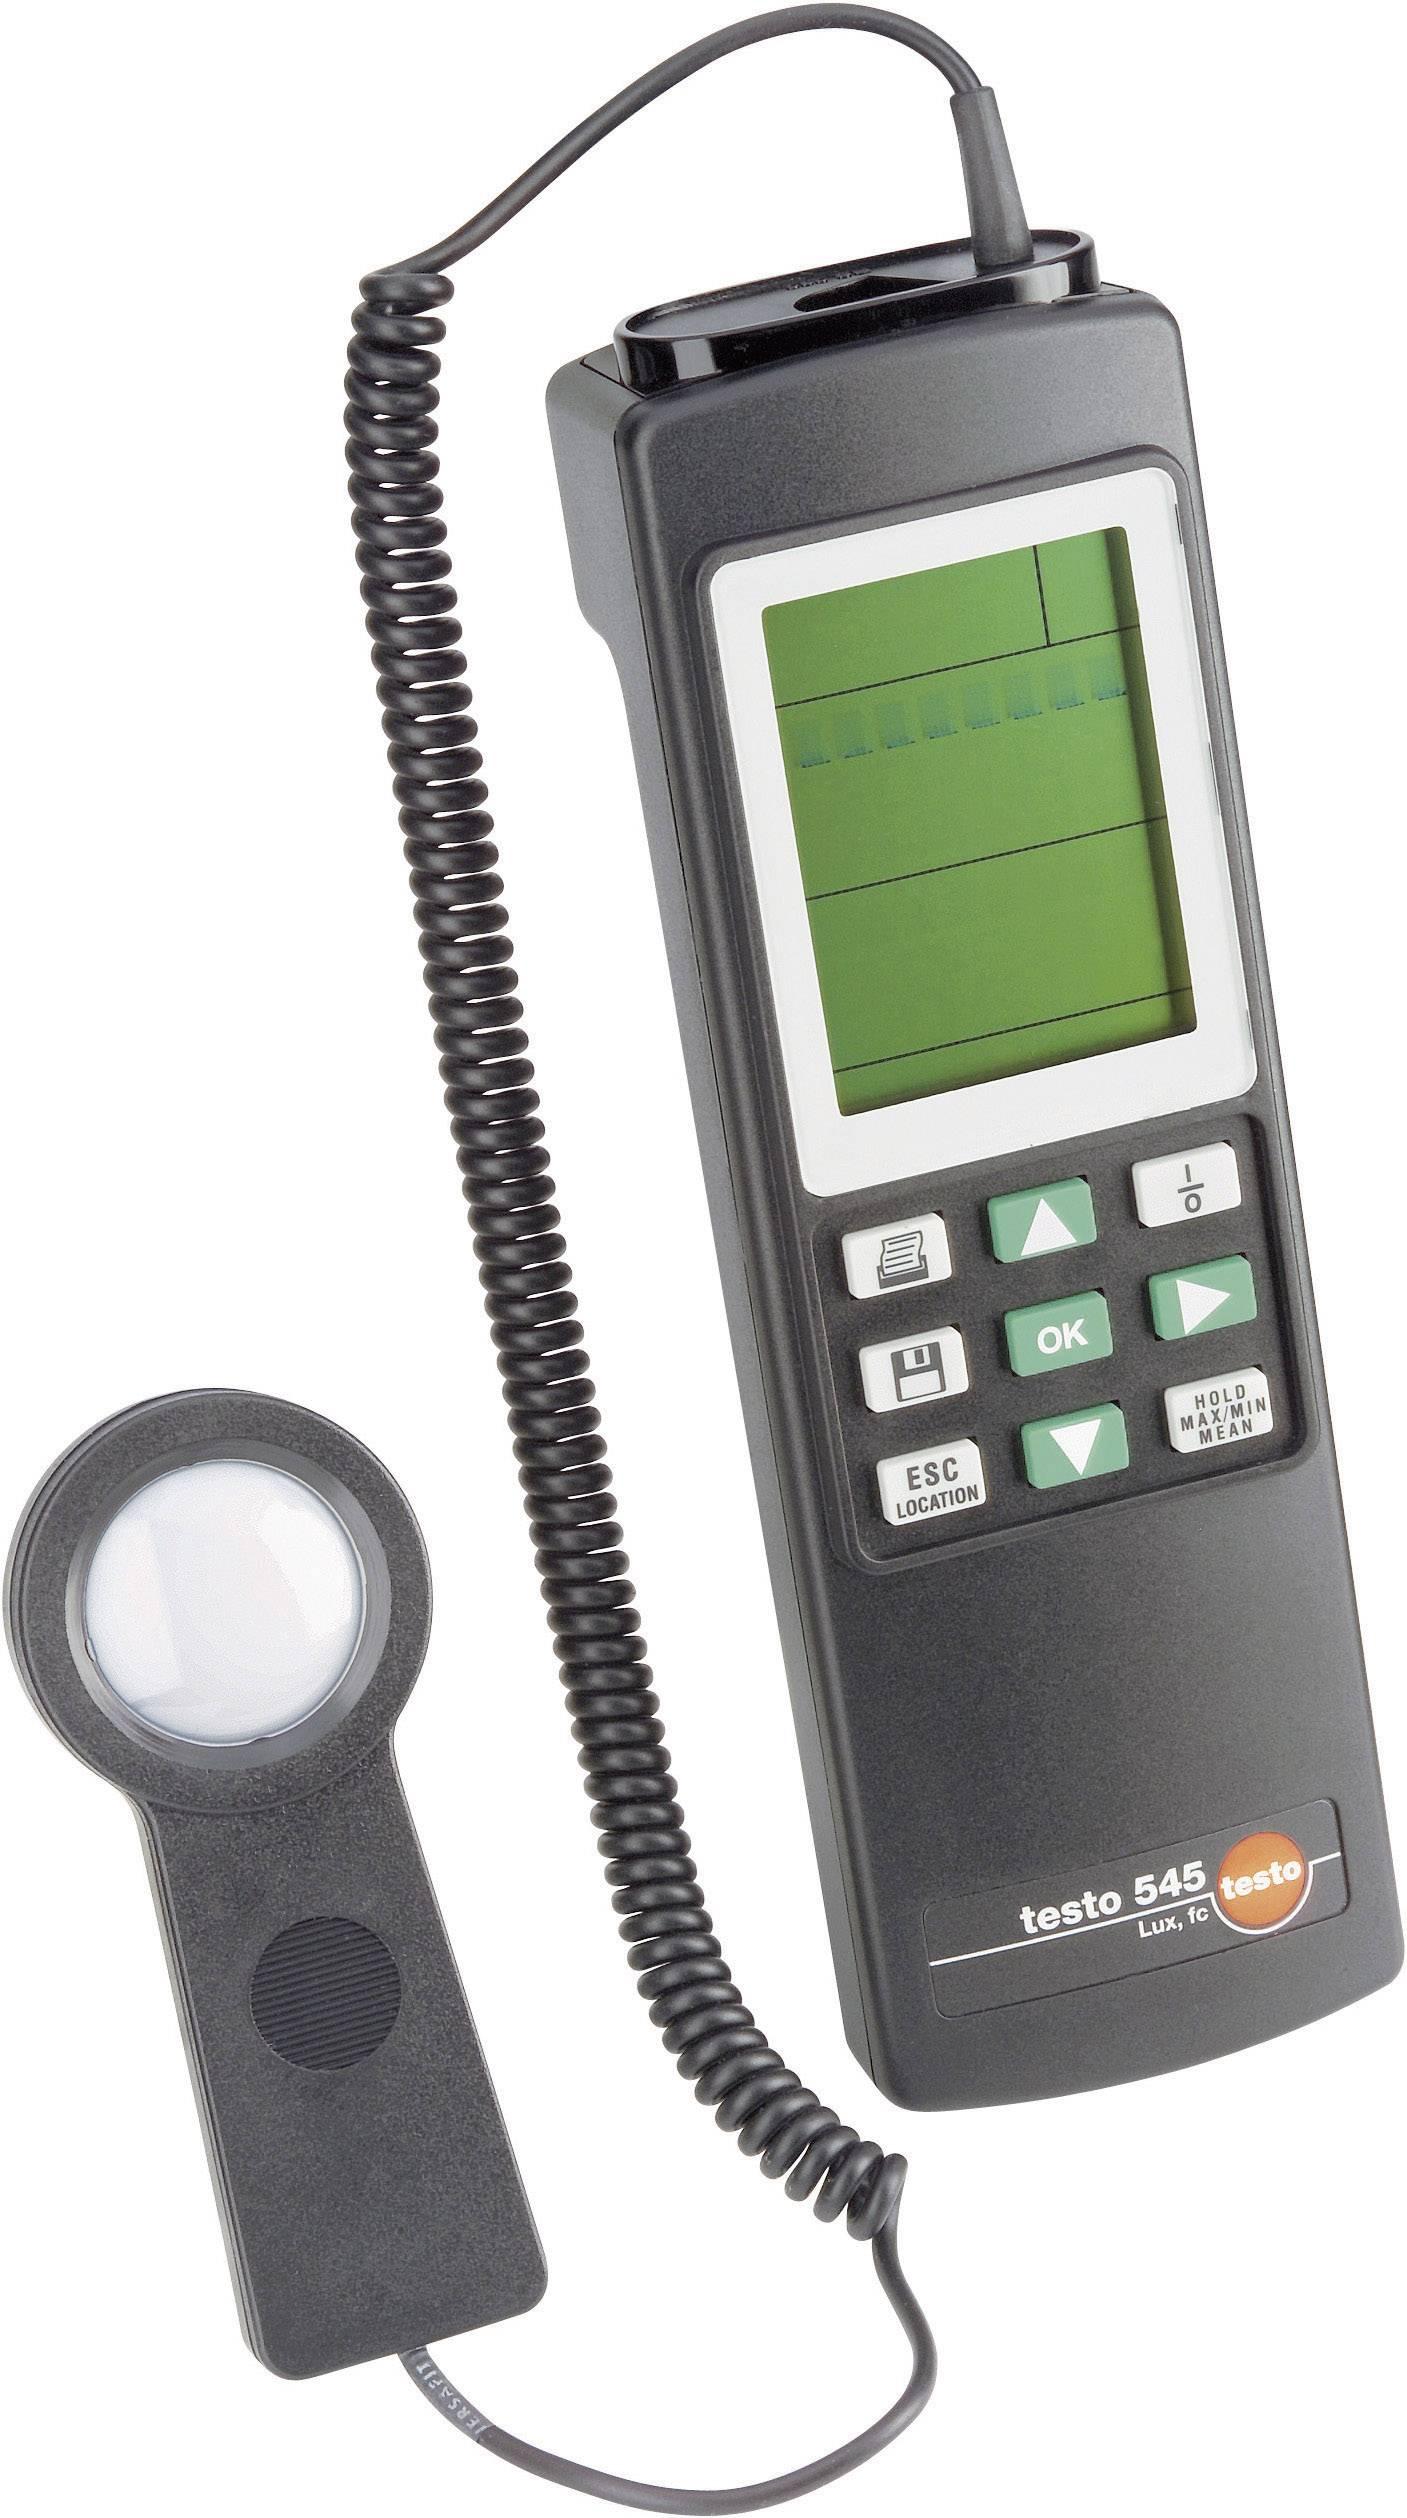 Digitálny luxmeter testo 545